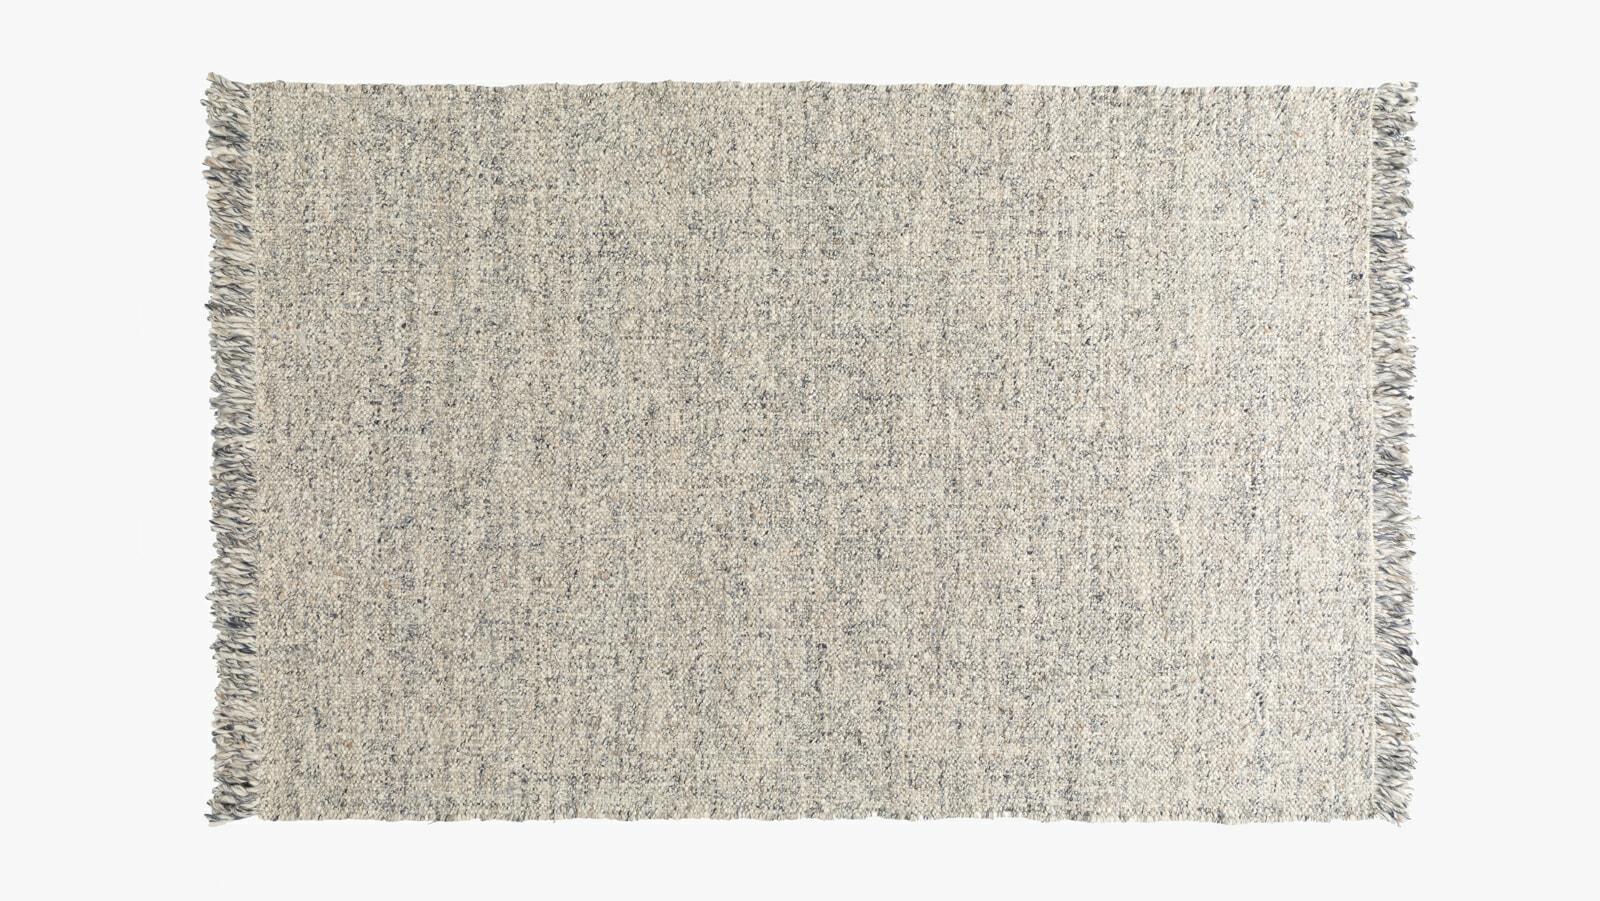 The Noa Sydney rug